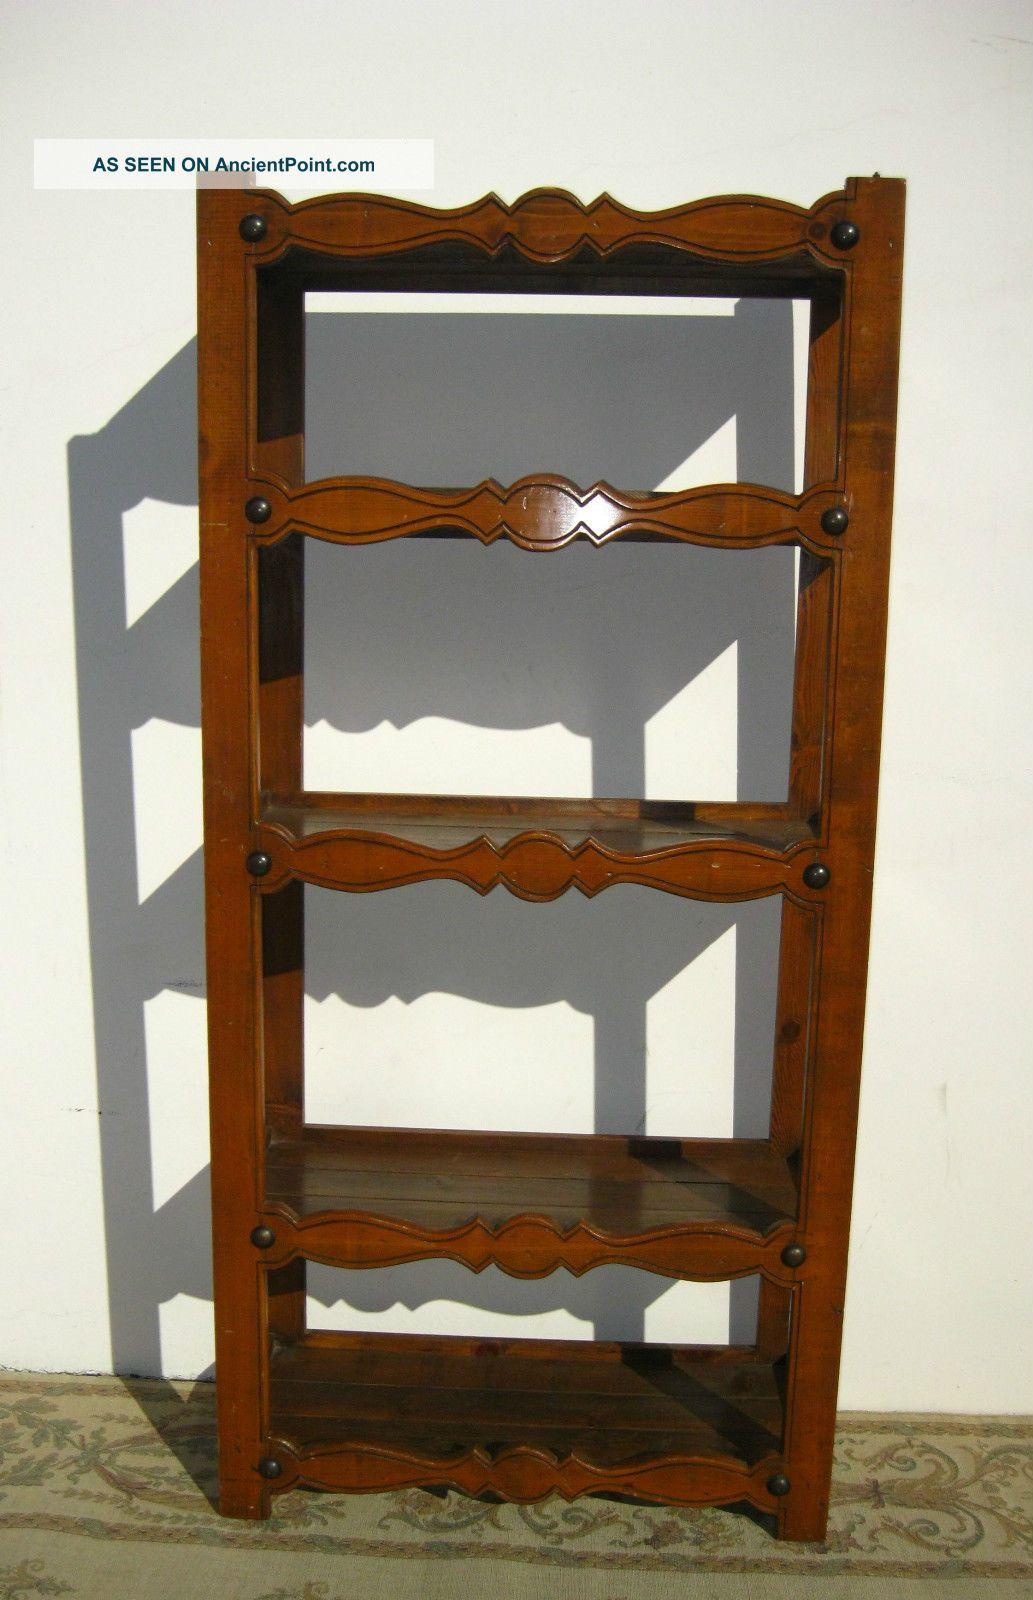 Vintage Rustic Spanish Style Wood Bookcase Bookshelf